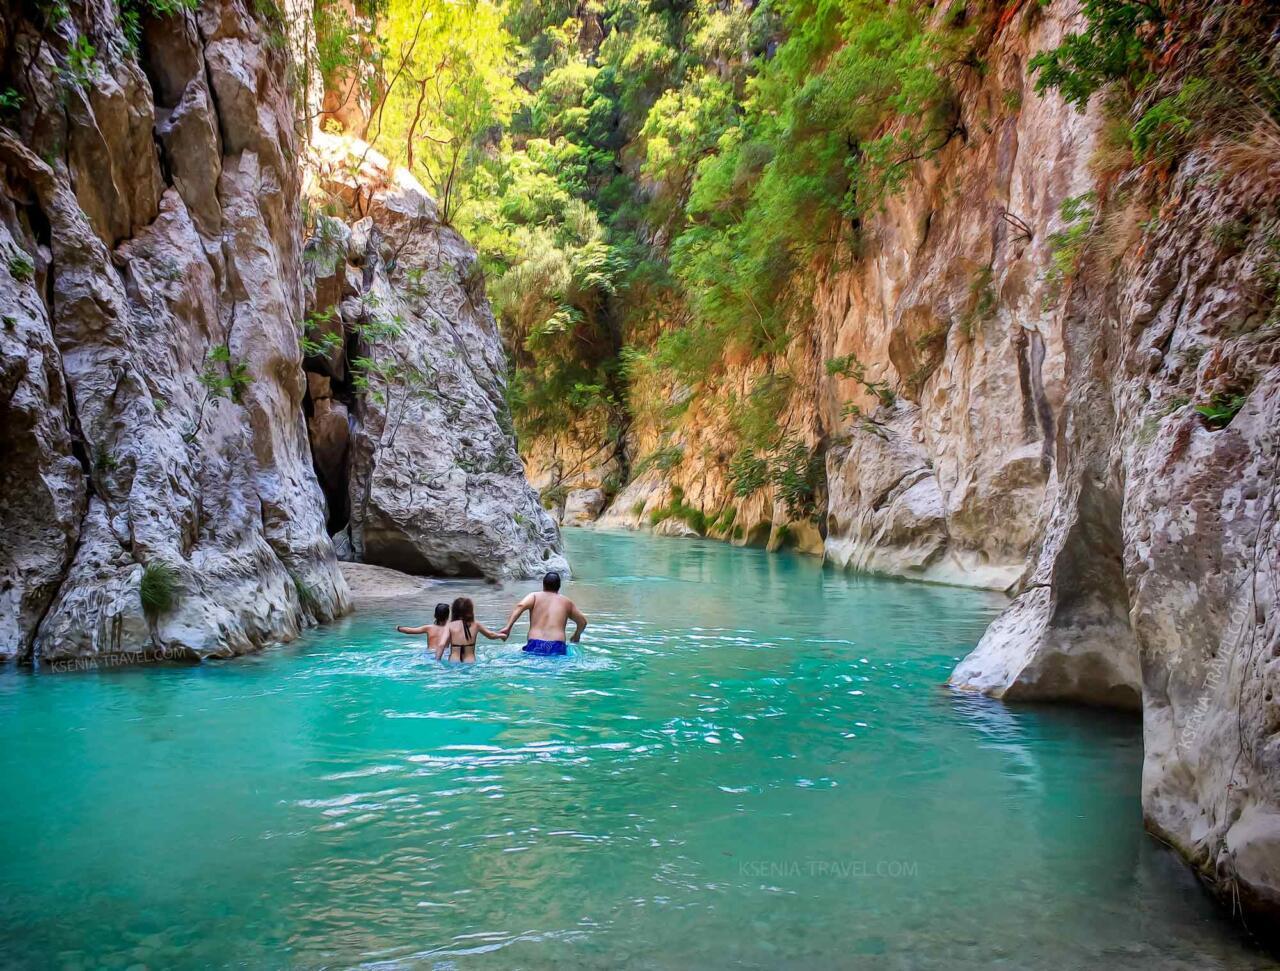 Ахерон-река скорби, экскурсии в Греции